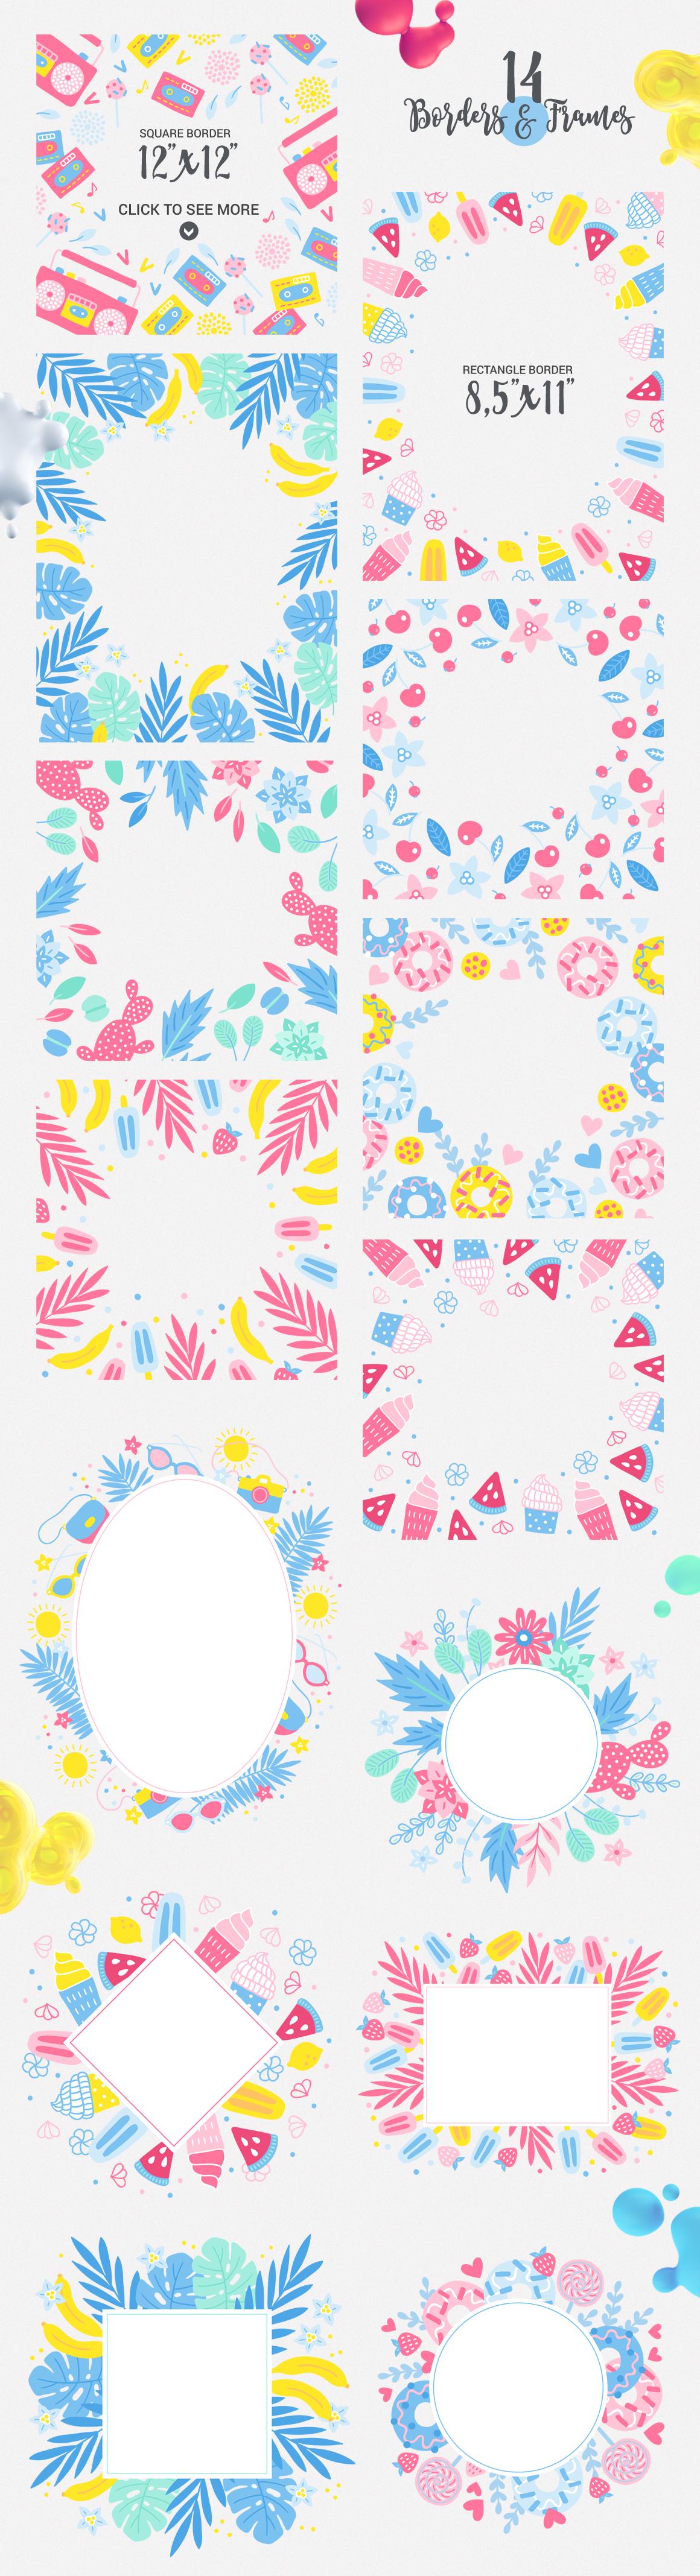 Punchy Pastels Kit example image 3